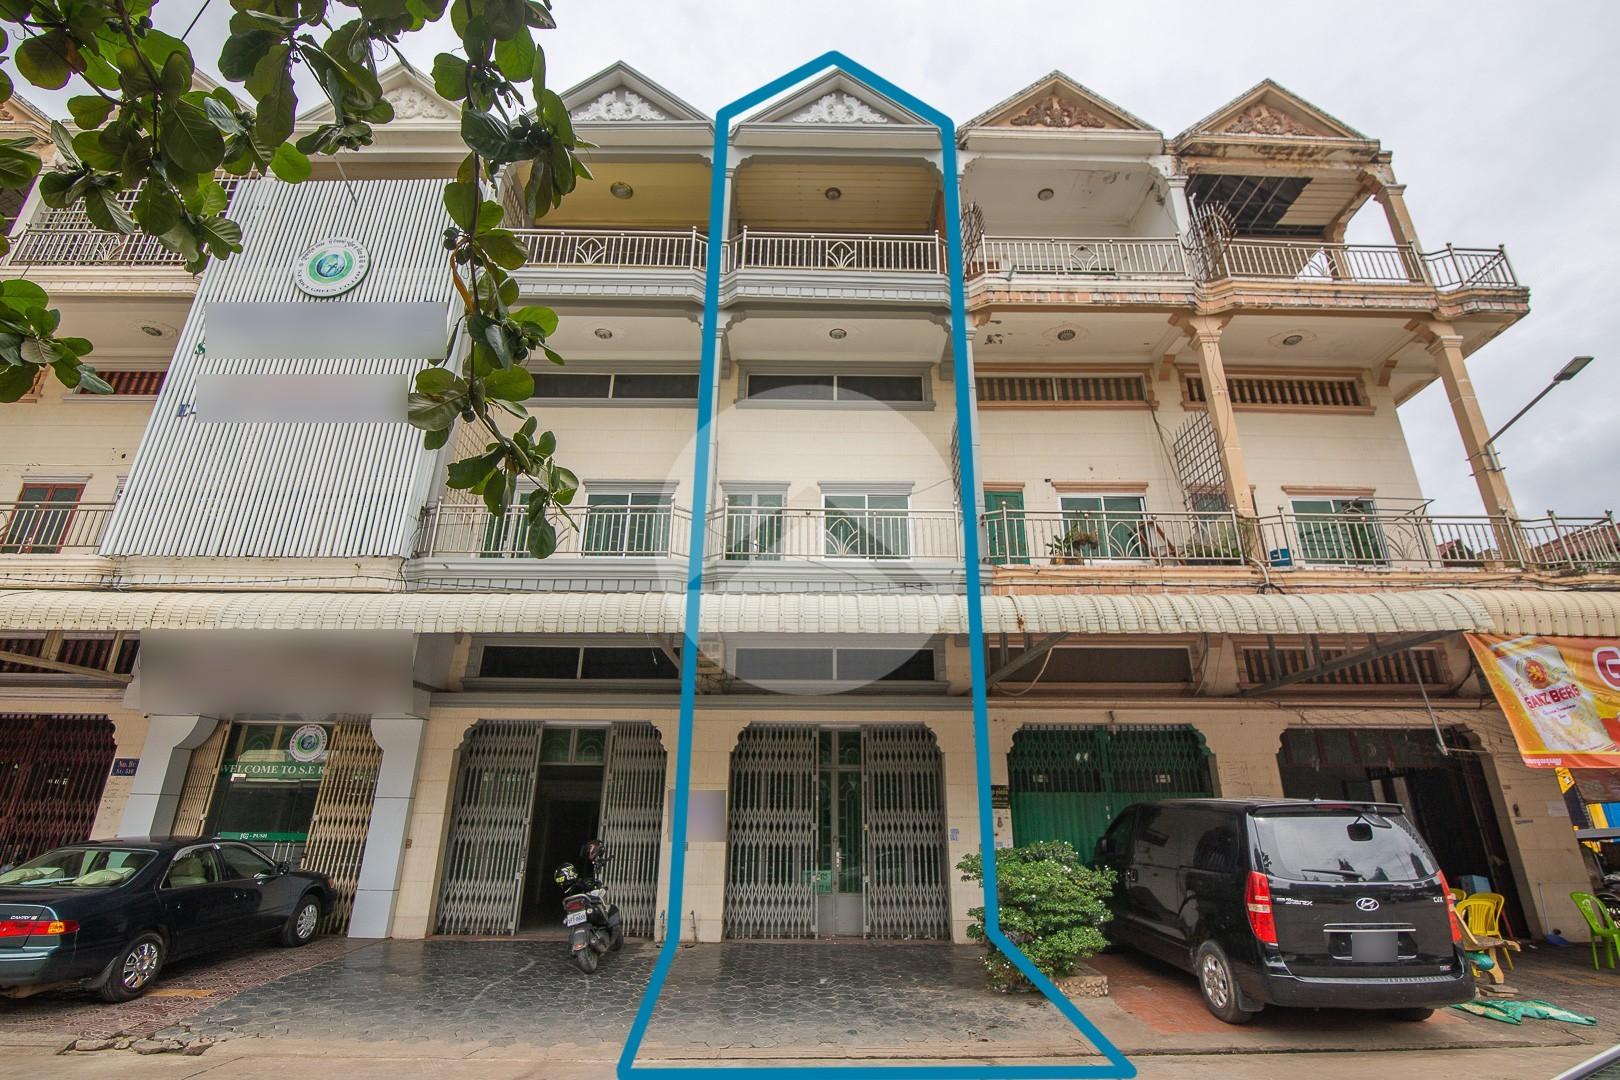 6 Bedroom Flat House For Sale - Toul Kork, Phnom Penh